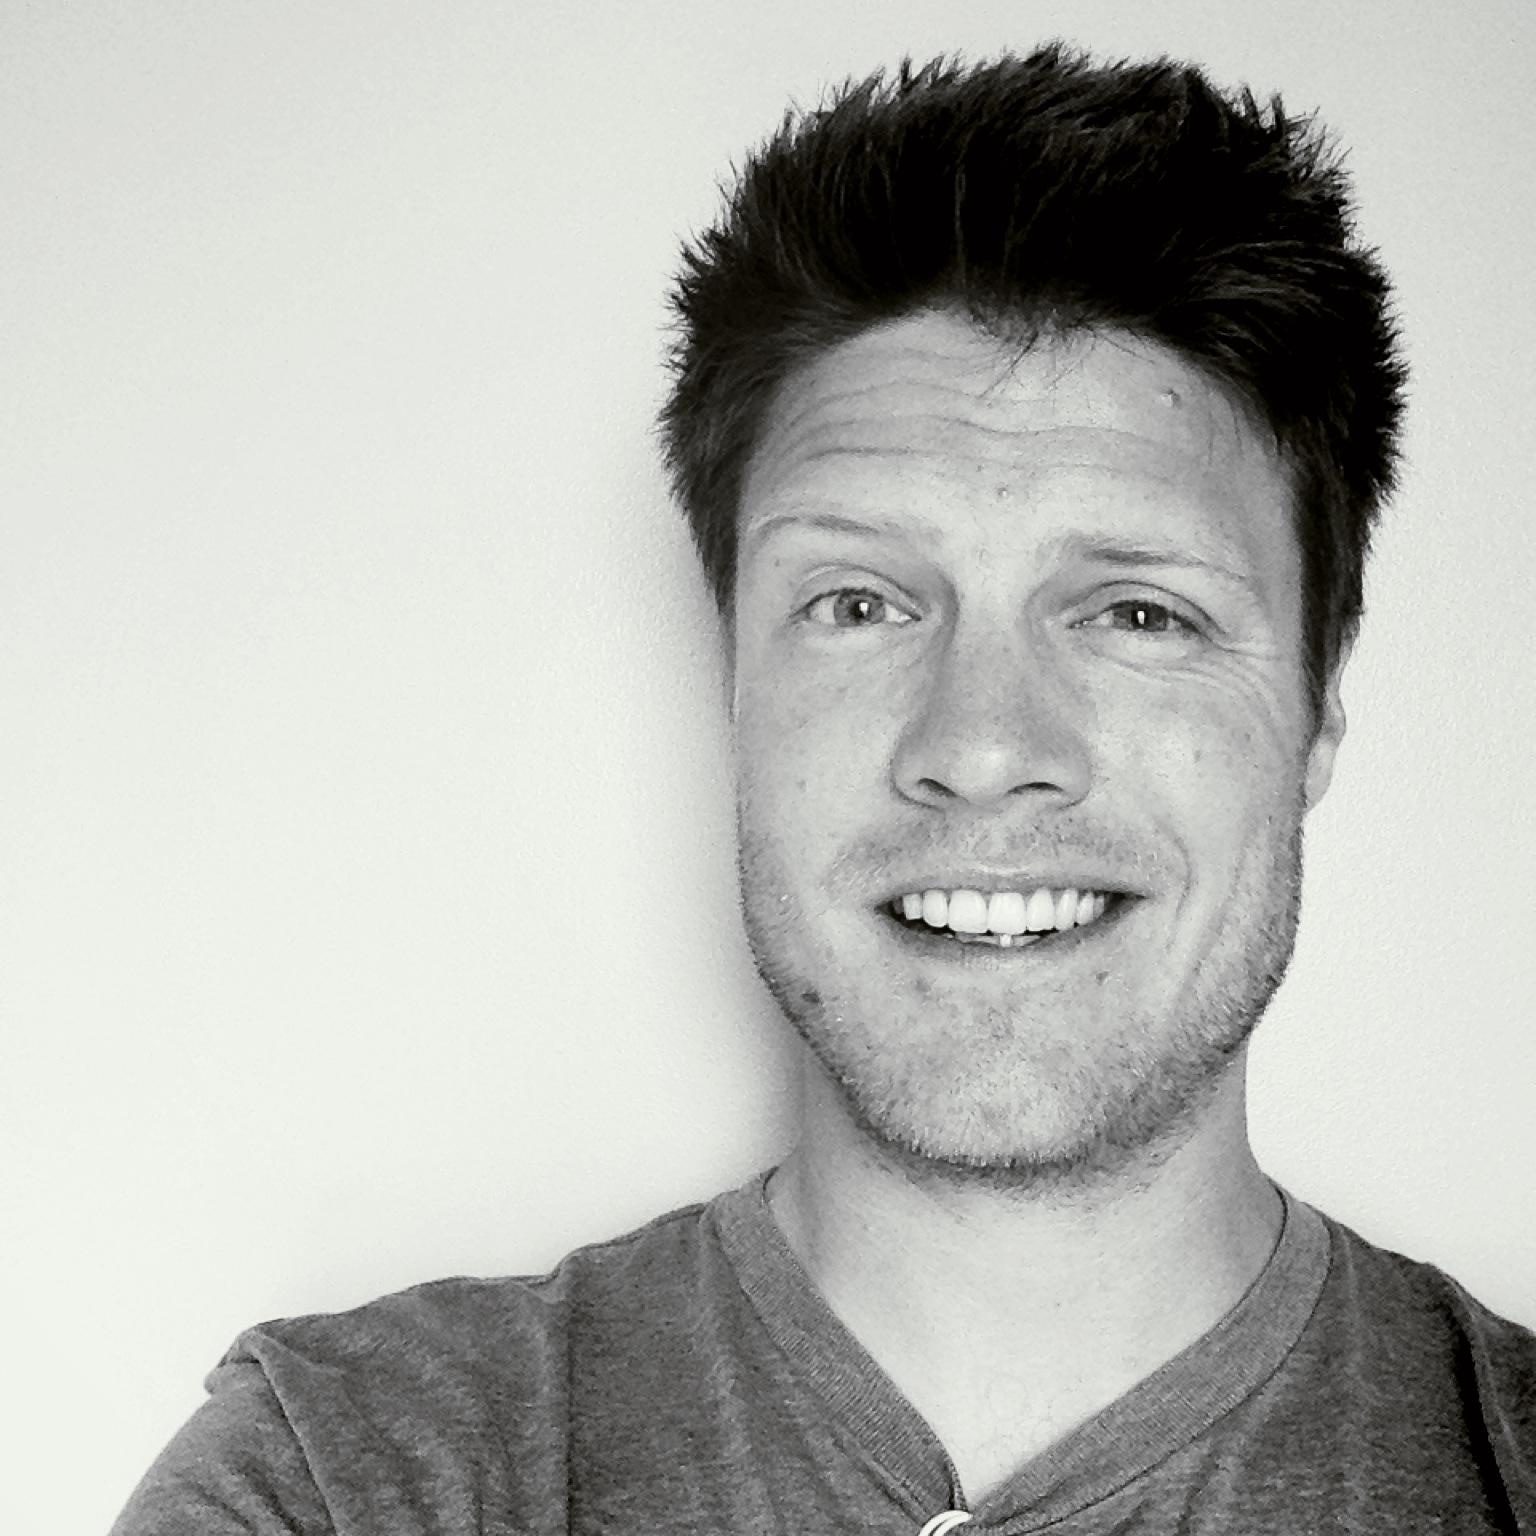 justin-jackson-profile-smile-selfie